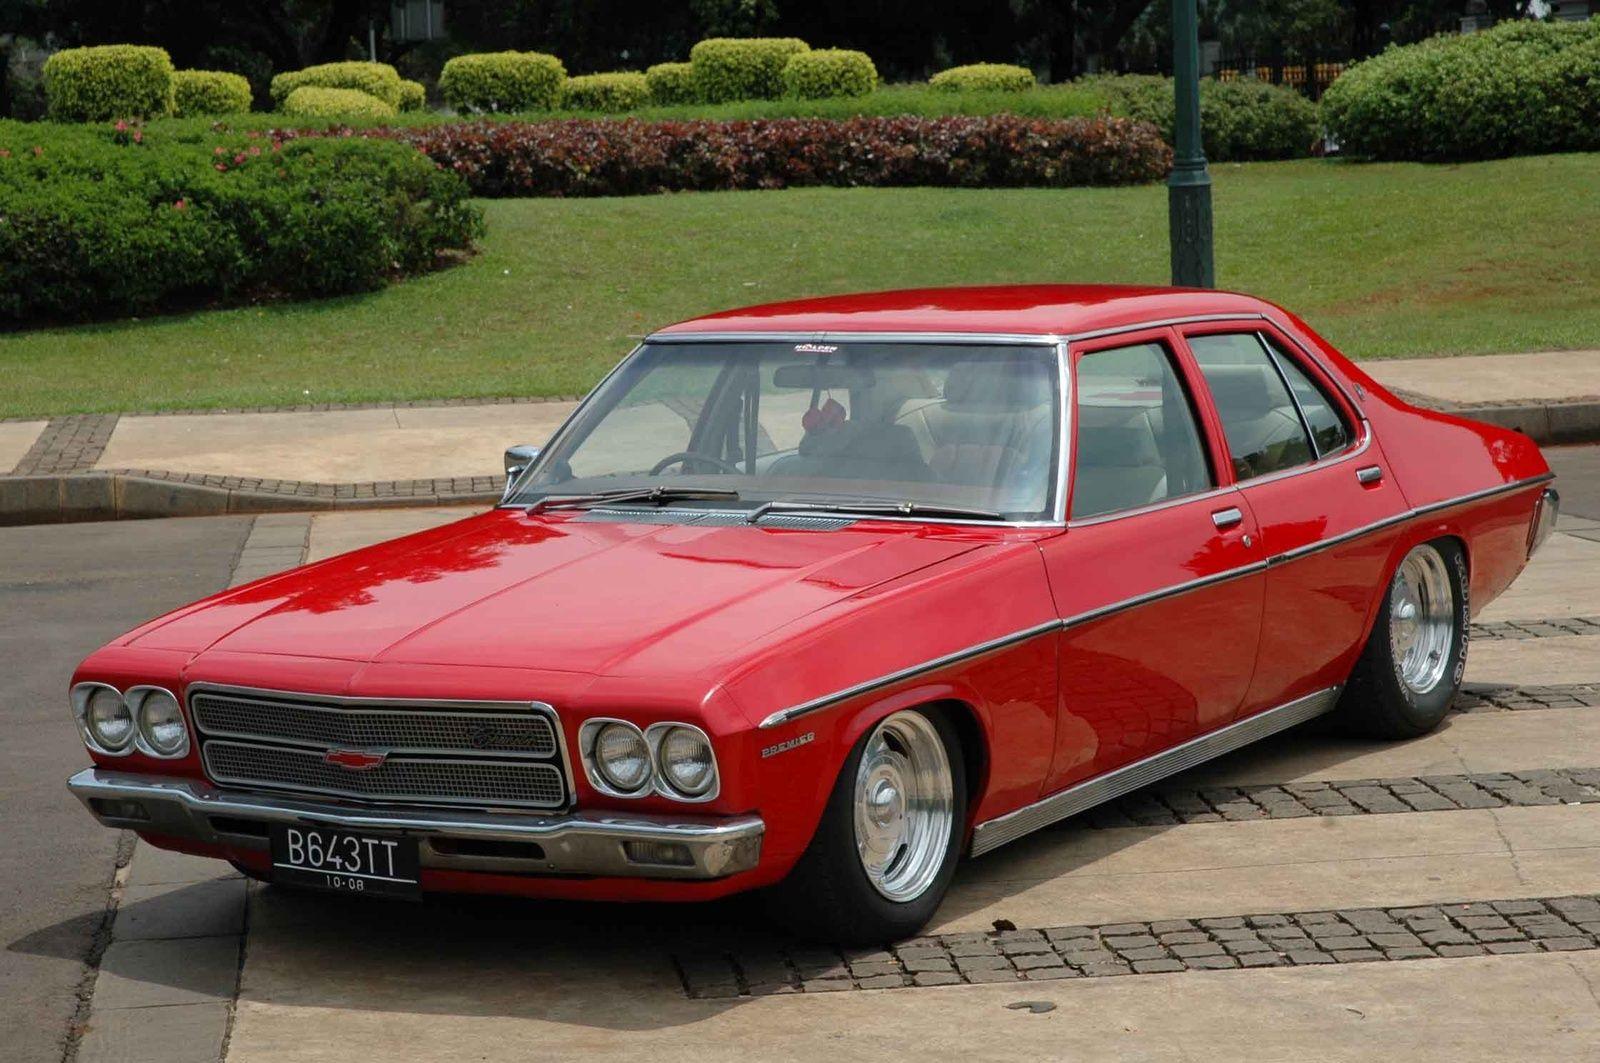 1972 Holden Premier Pictures Cargurus Holden Premier Holden